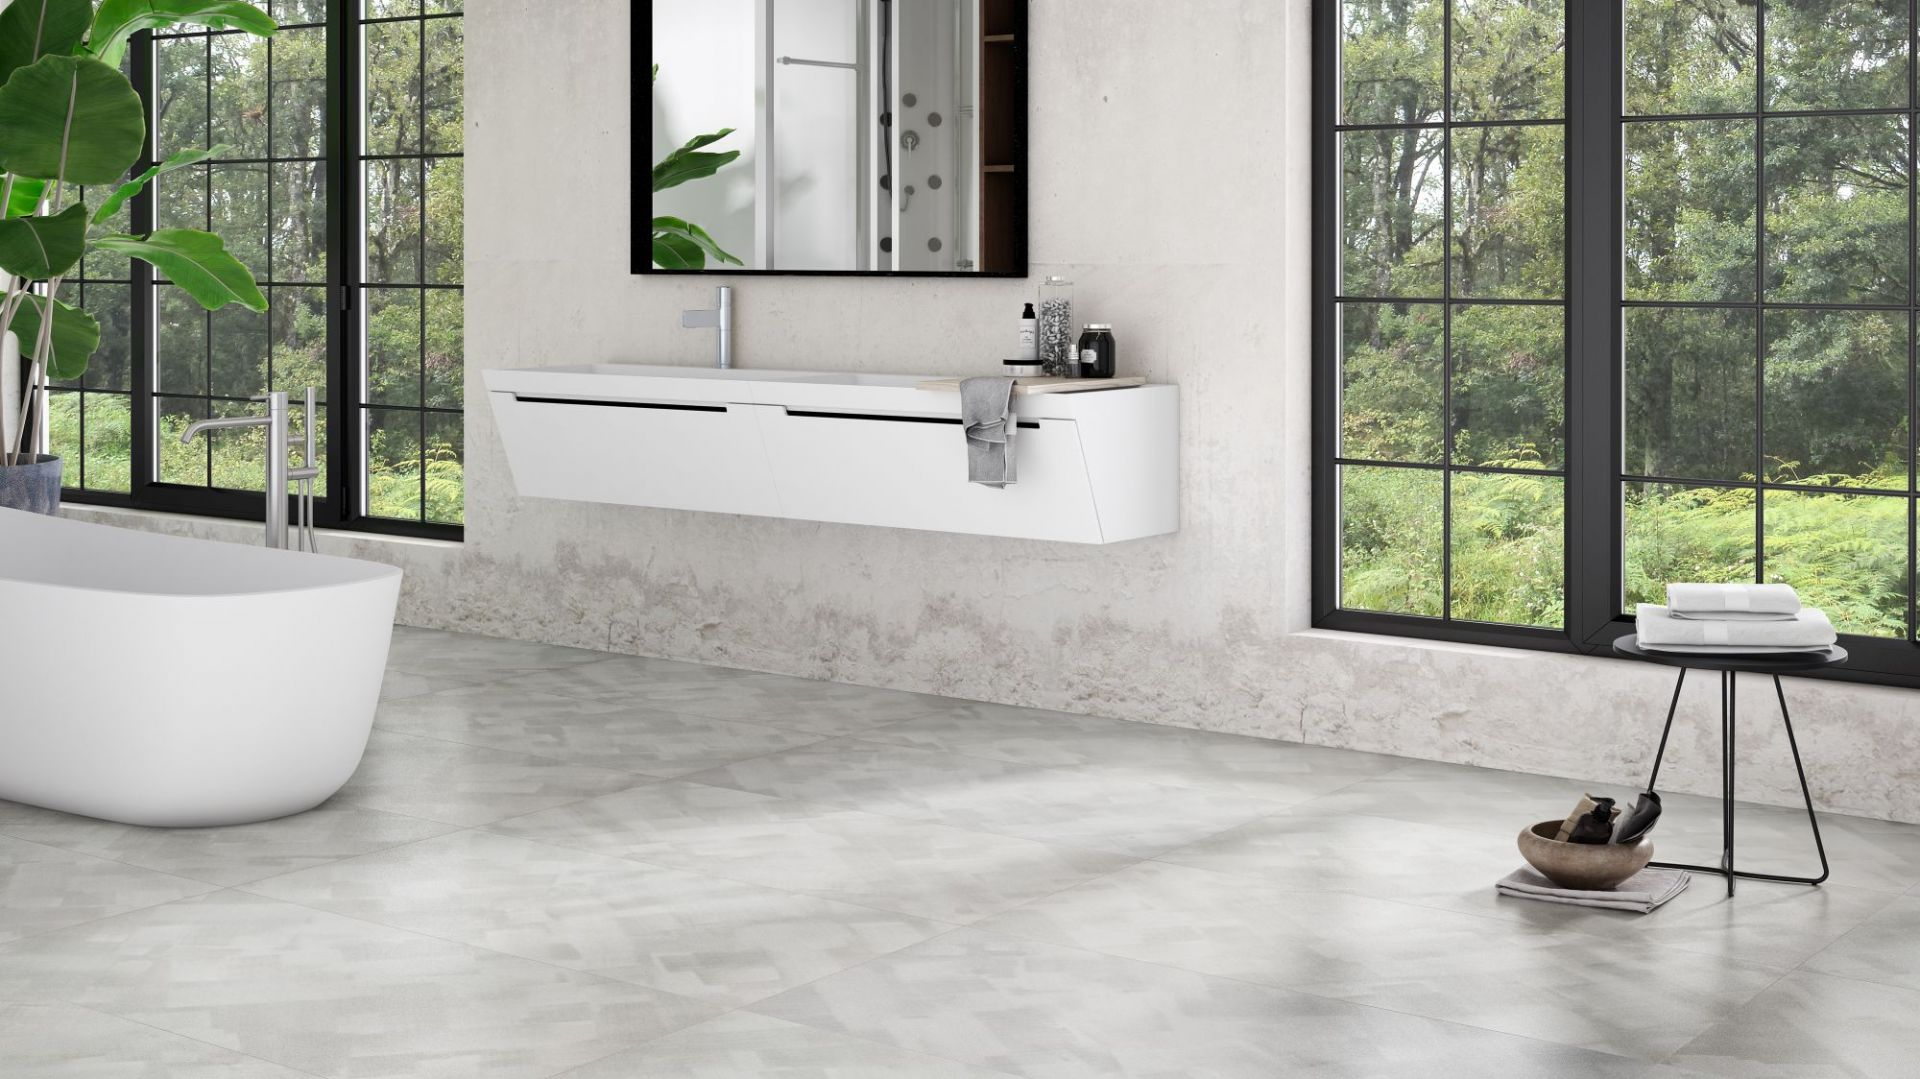 Nowoczesna łazienka. 30 pięknych kolekcji płytek ceramicznych. Producent Apavisa, kolekcja Aluminum.Fot. Apavisa